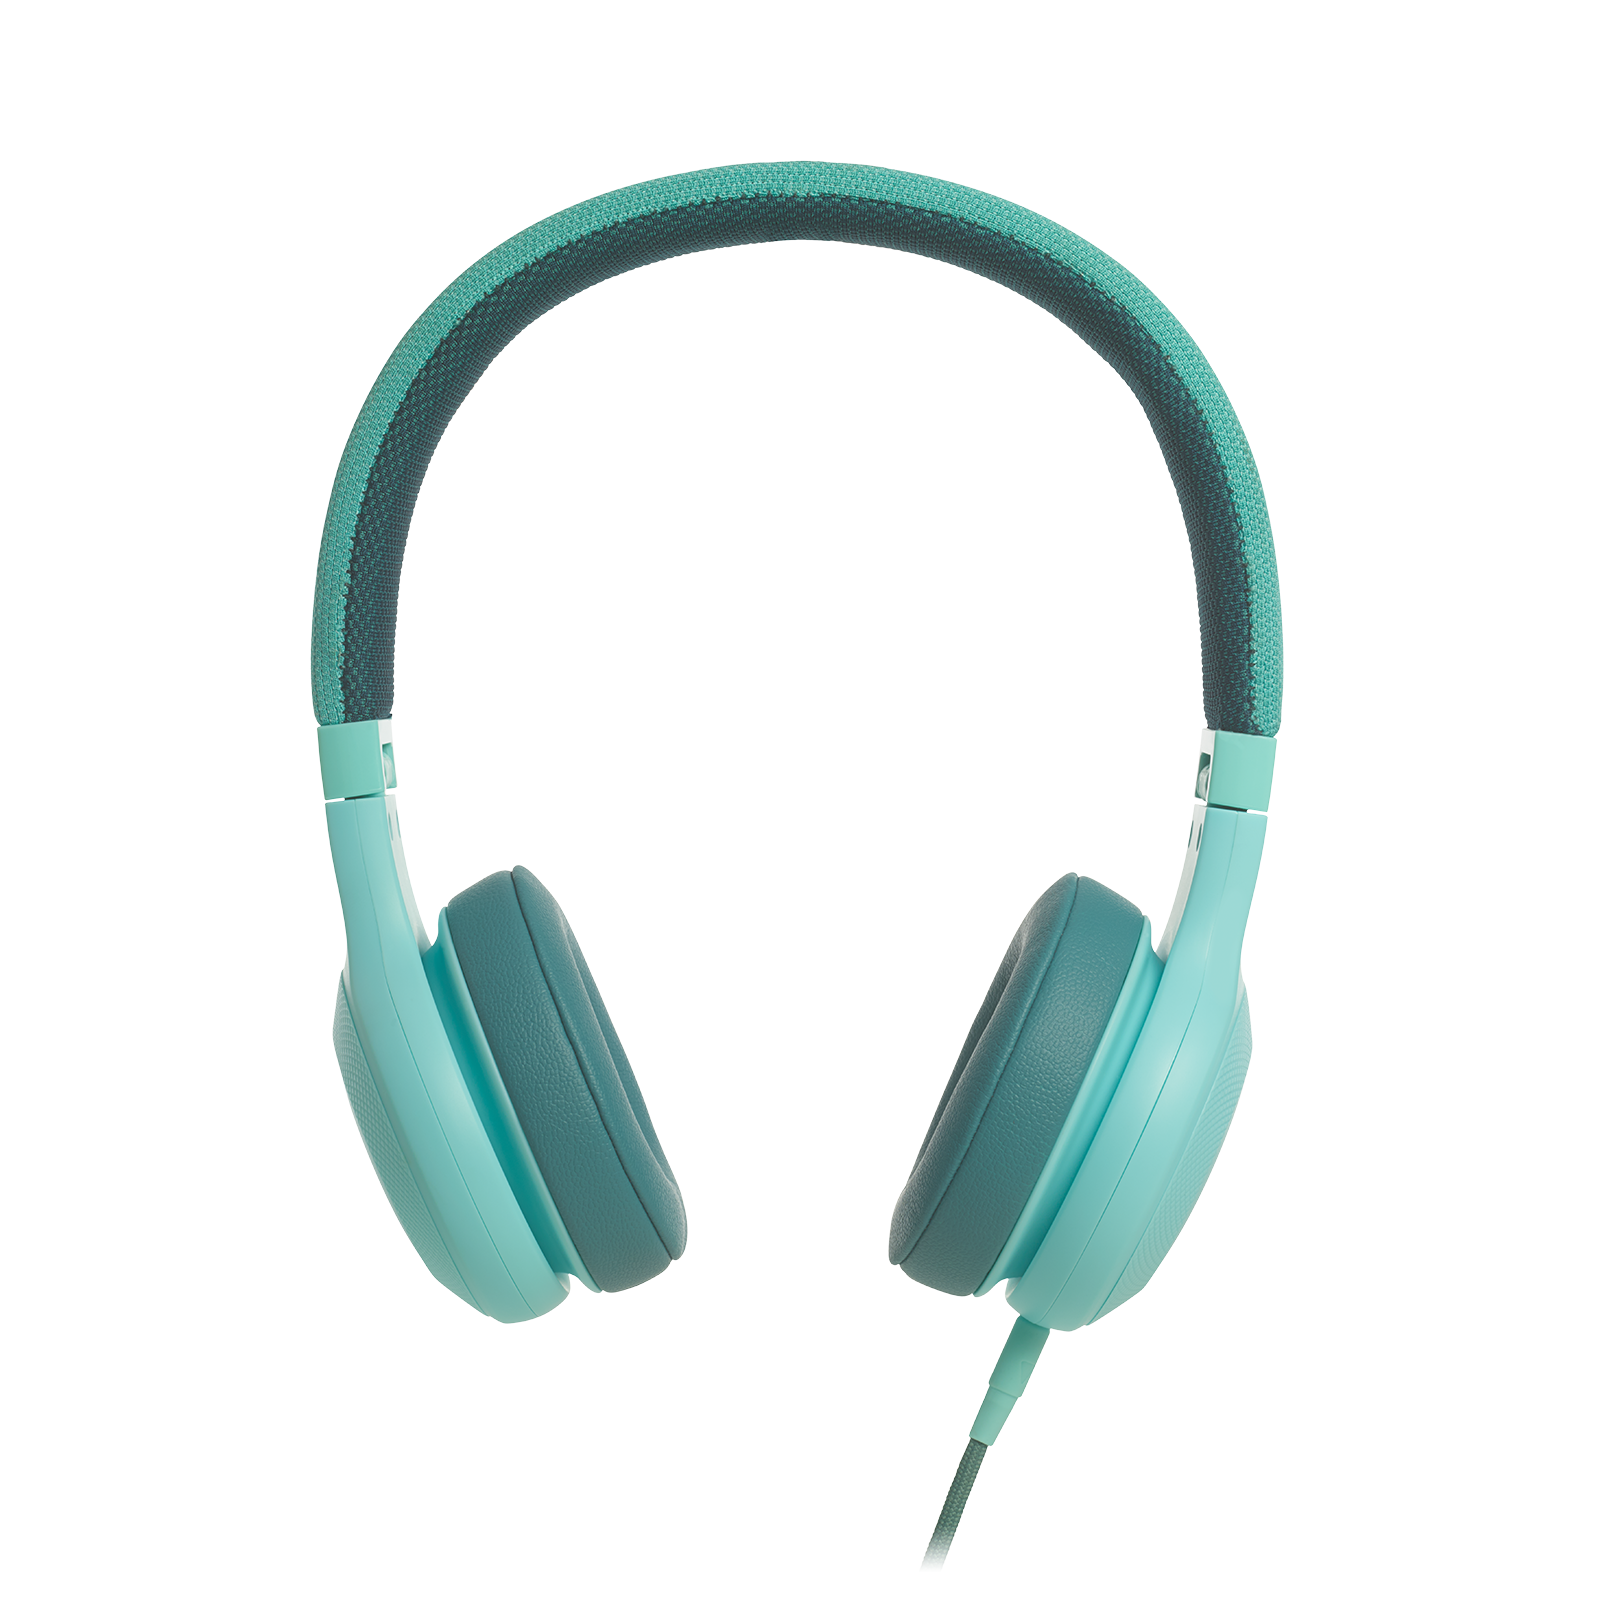 E35 - Teal - On-ear headphones - Detailshot 2